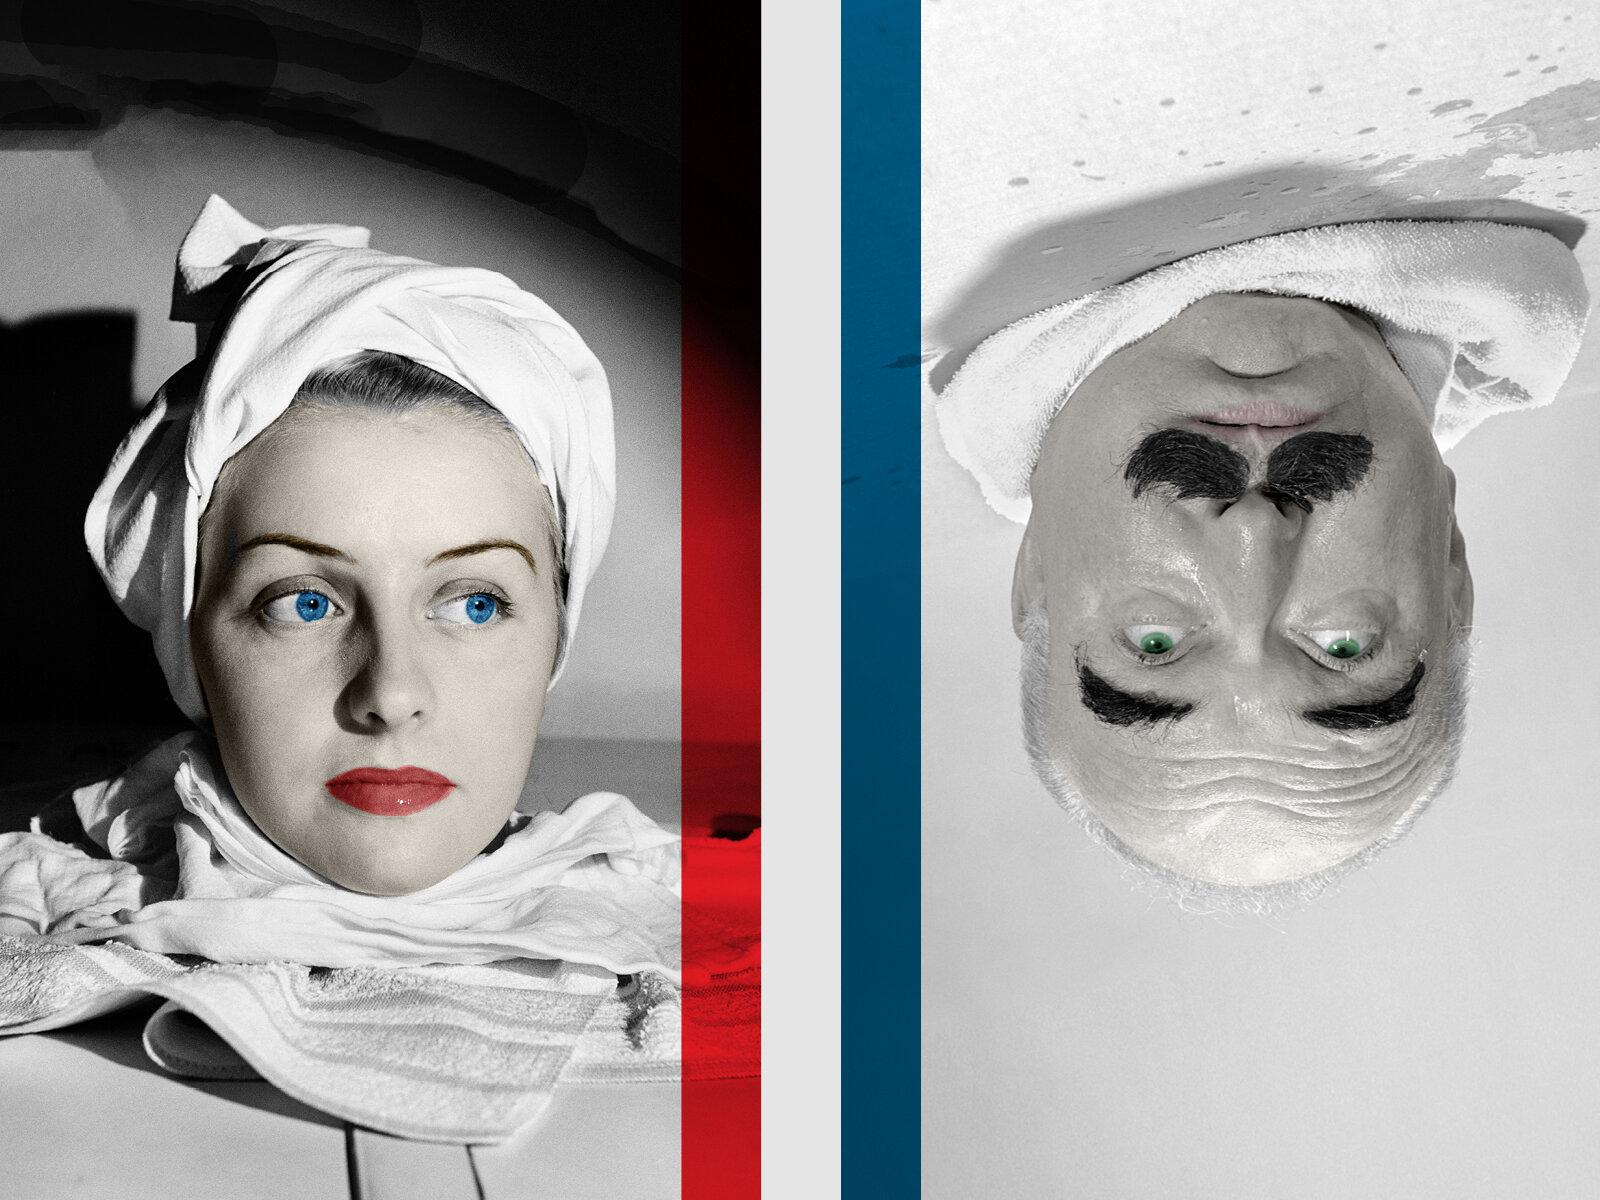 https://www.arts.ubc.ca/wp-content/uploads/sites/24/2020/09/Opera-Banners-Viaggio-1600x1200.jpg